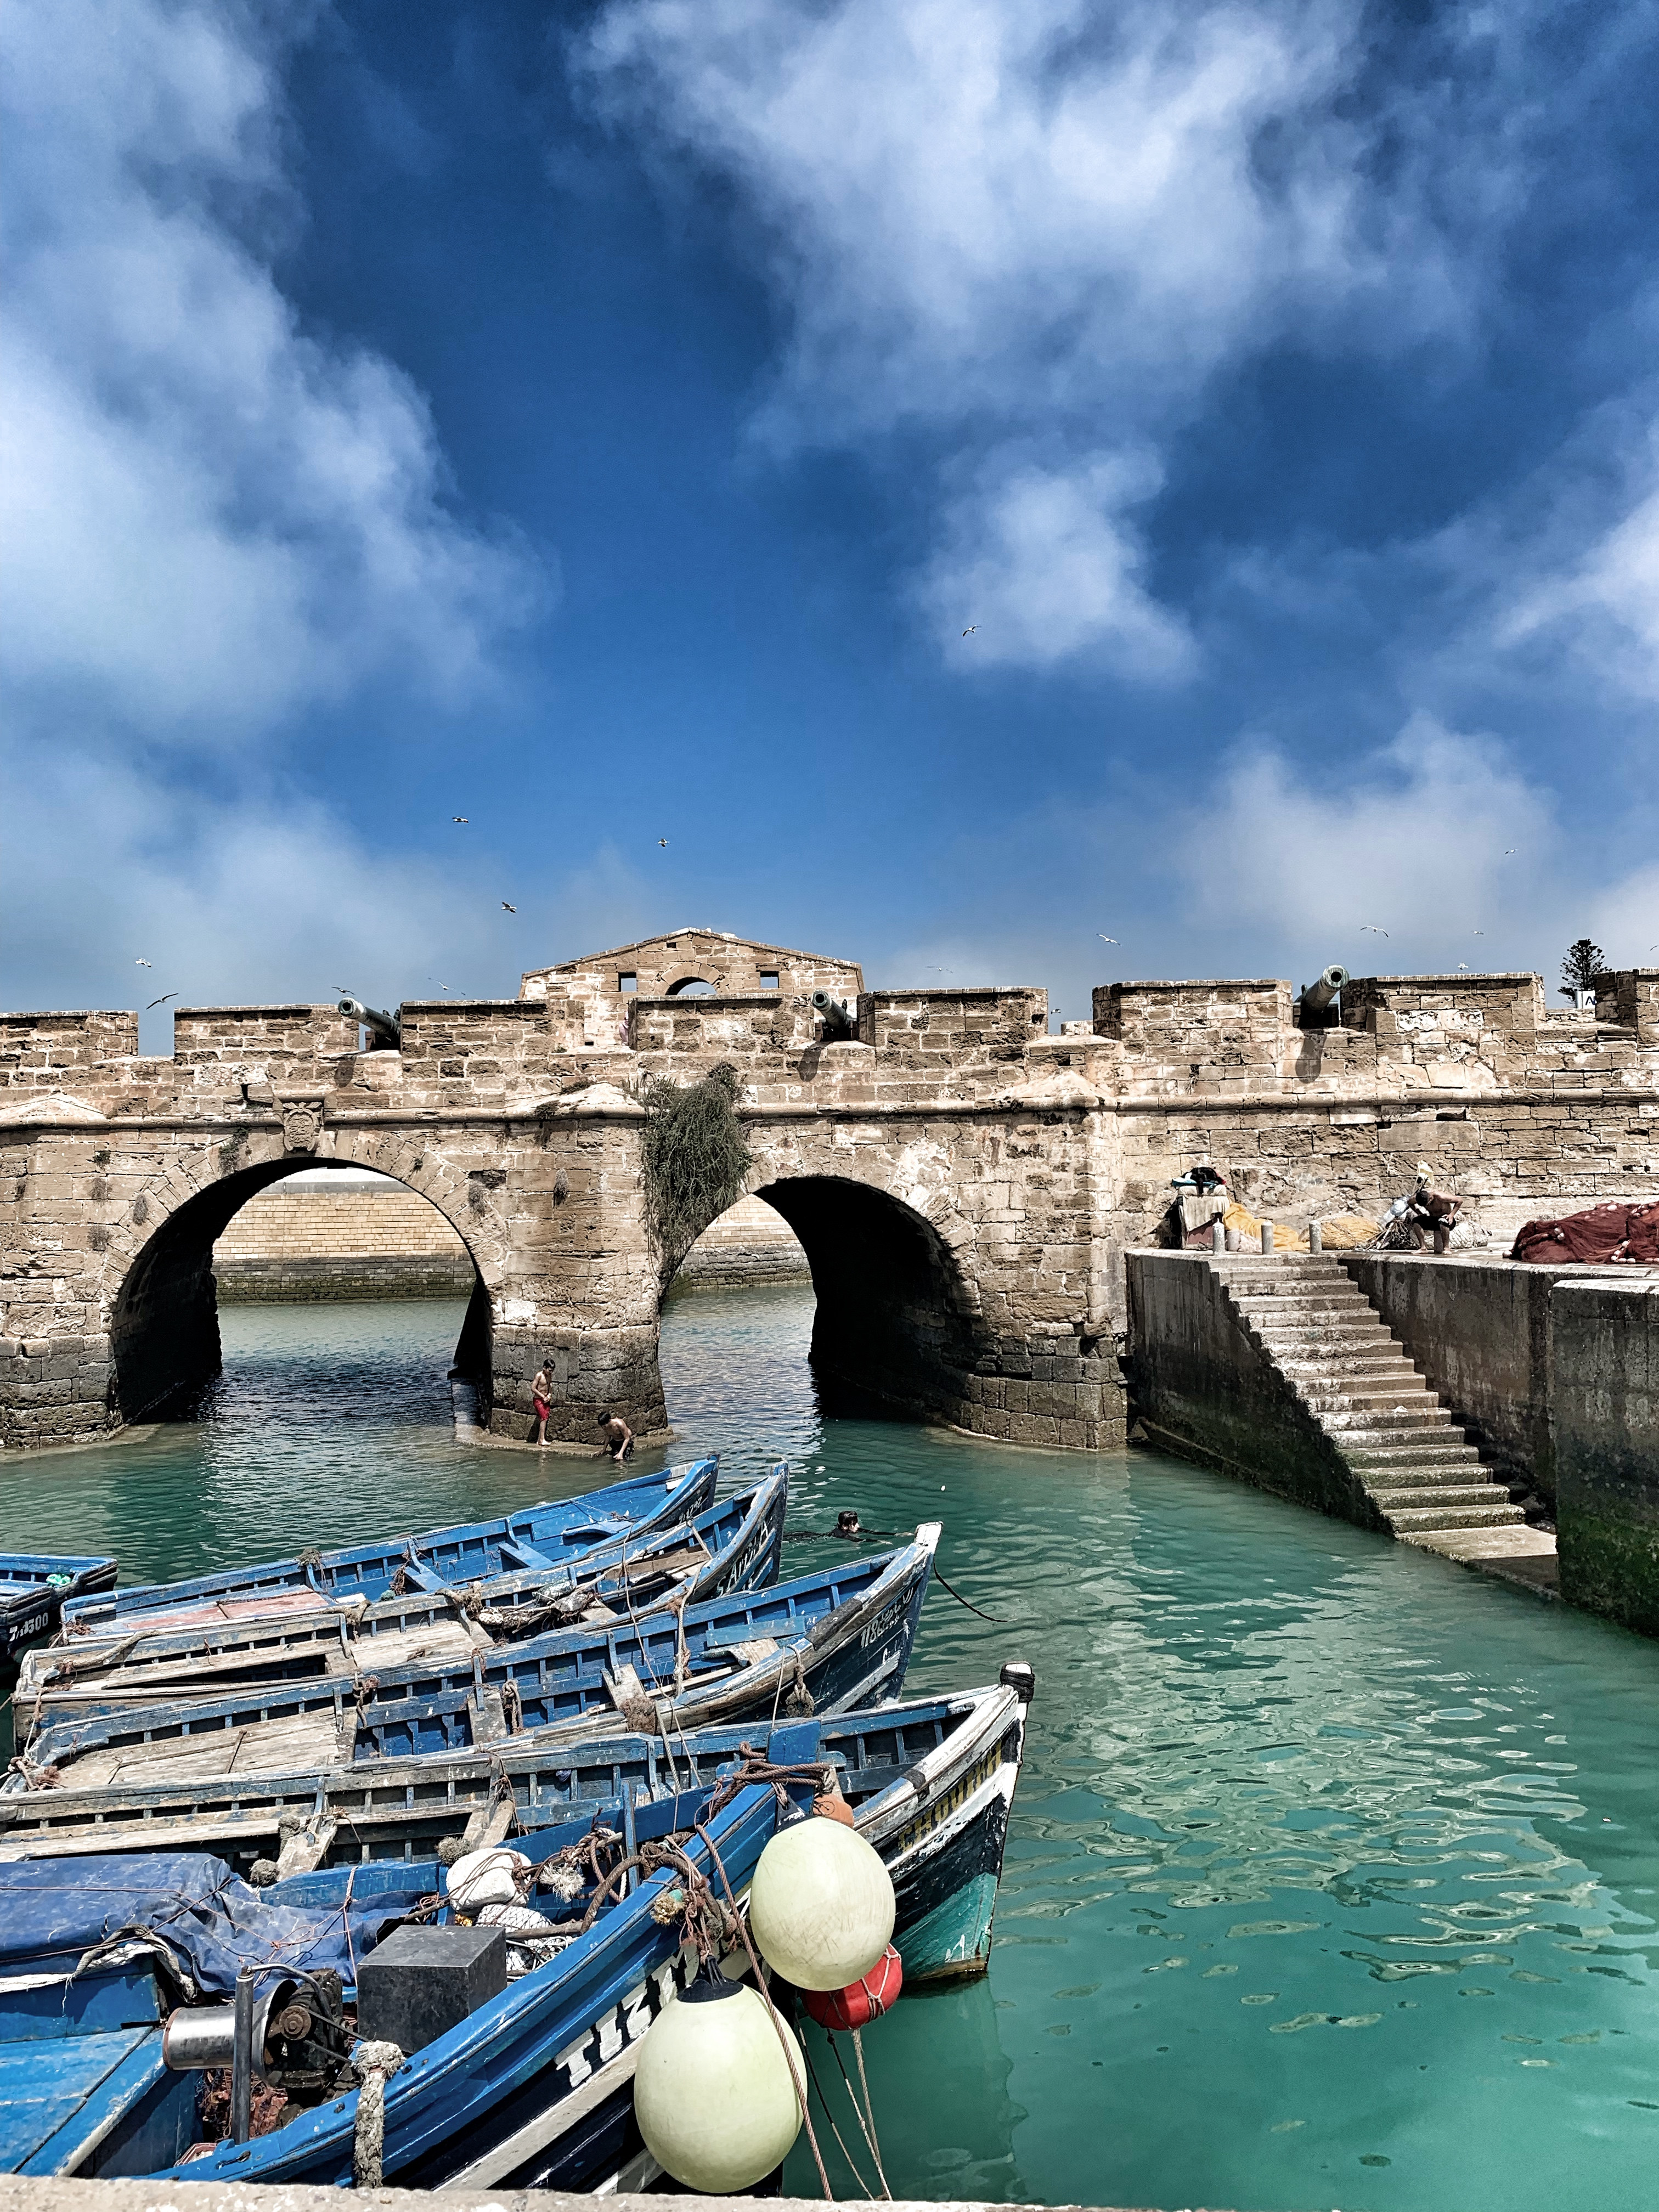 Tagestour nach Essaouira